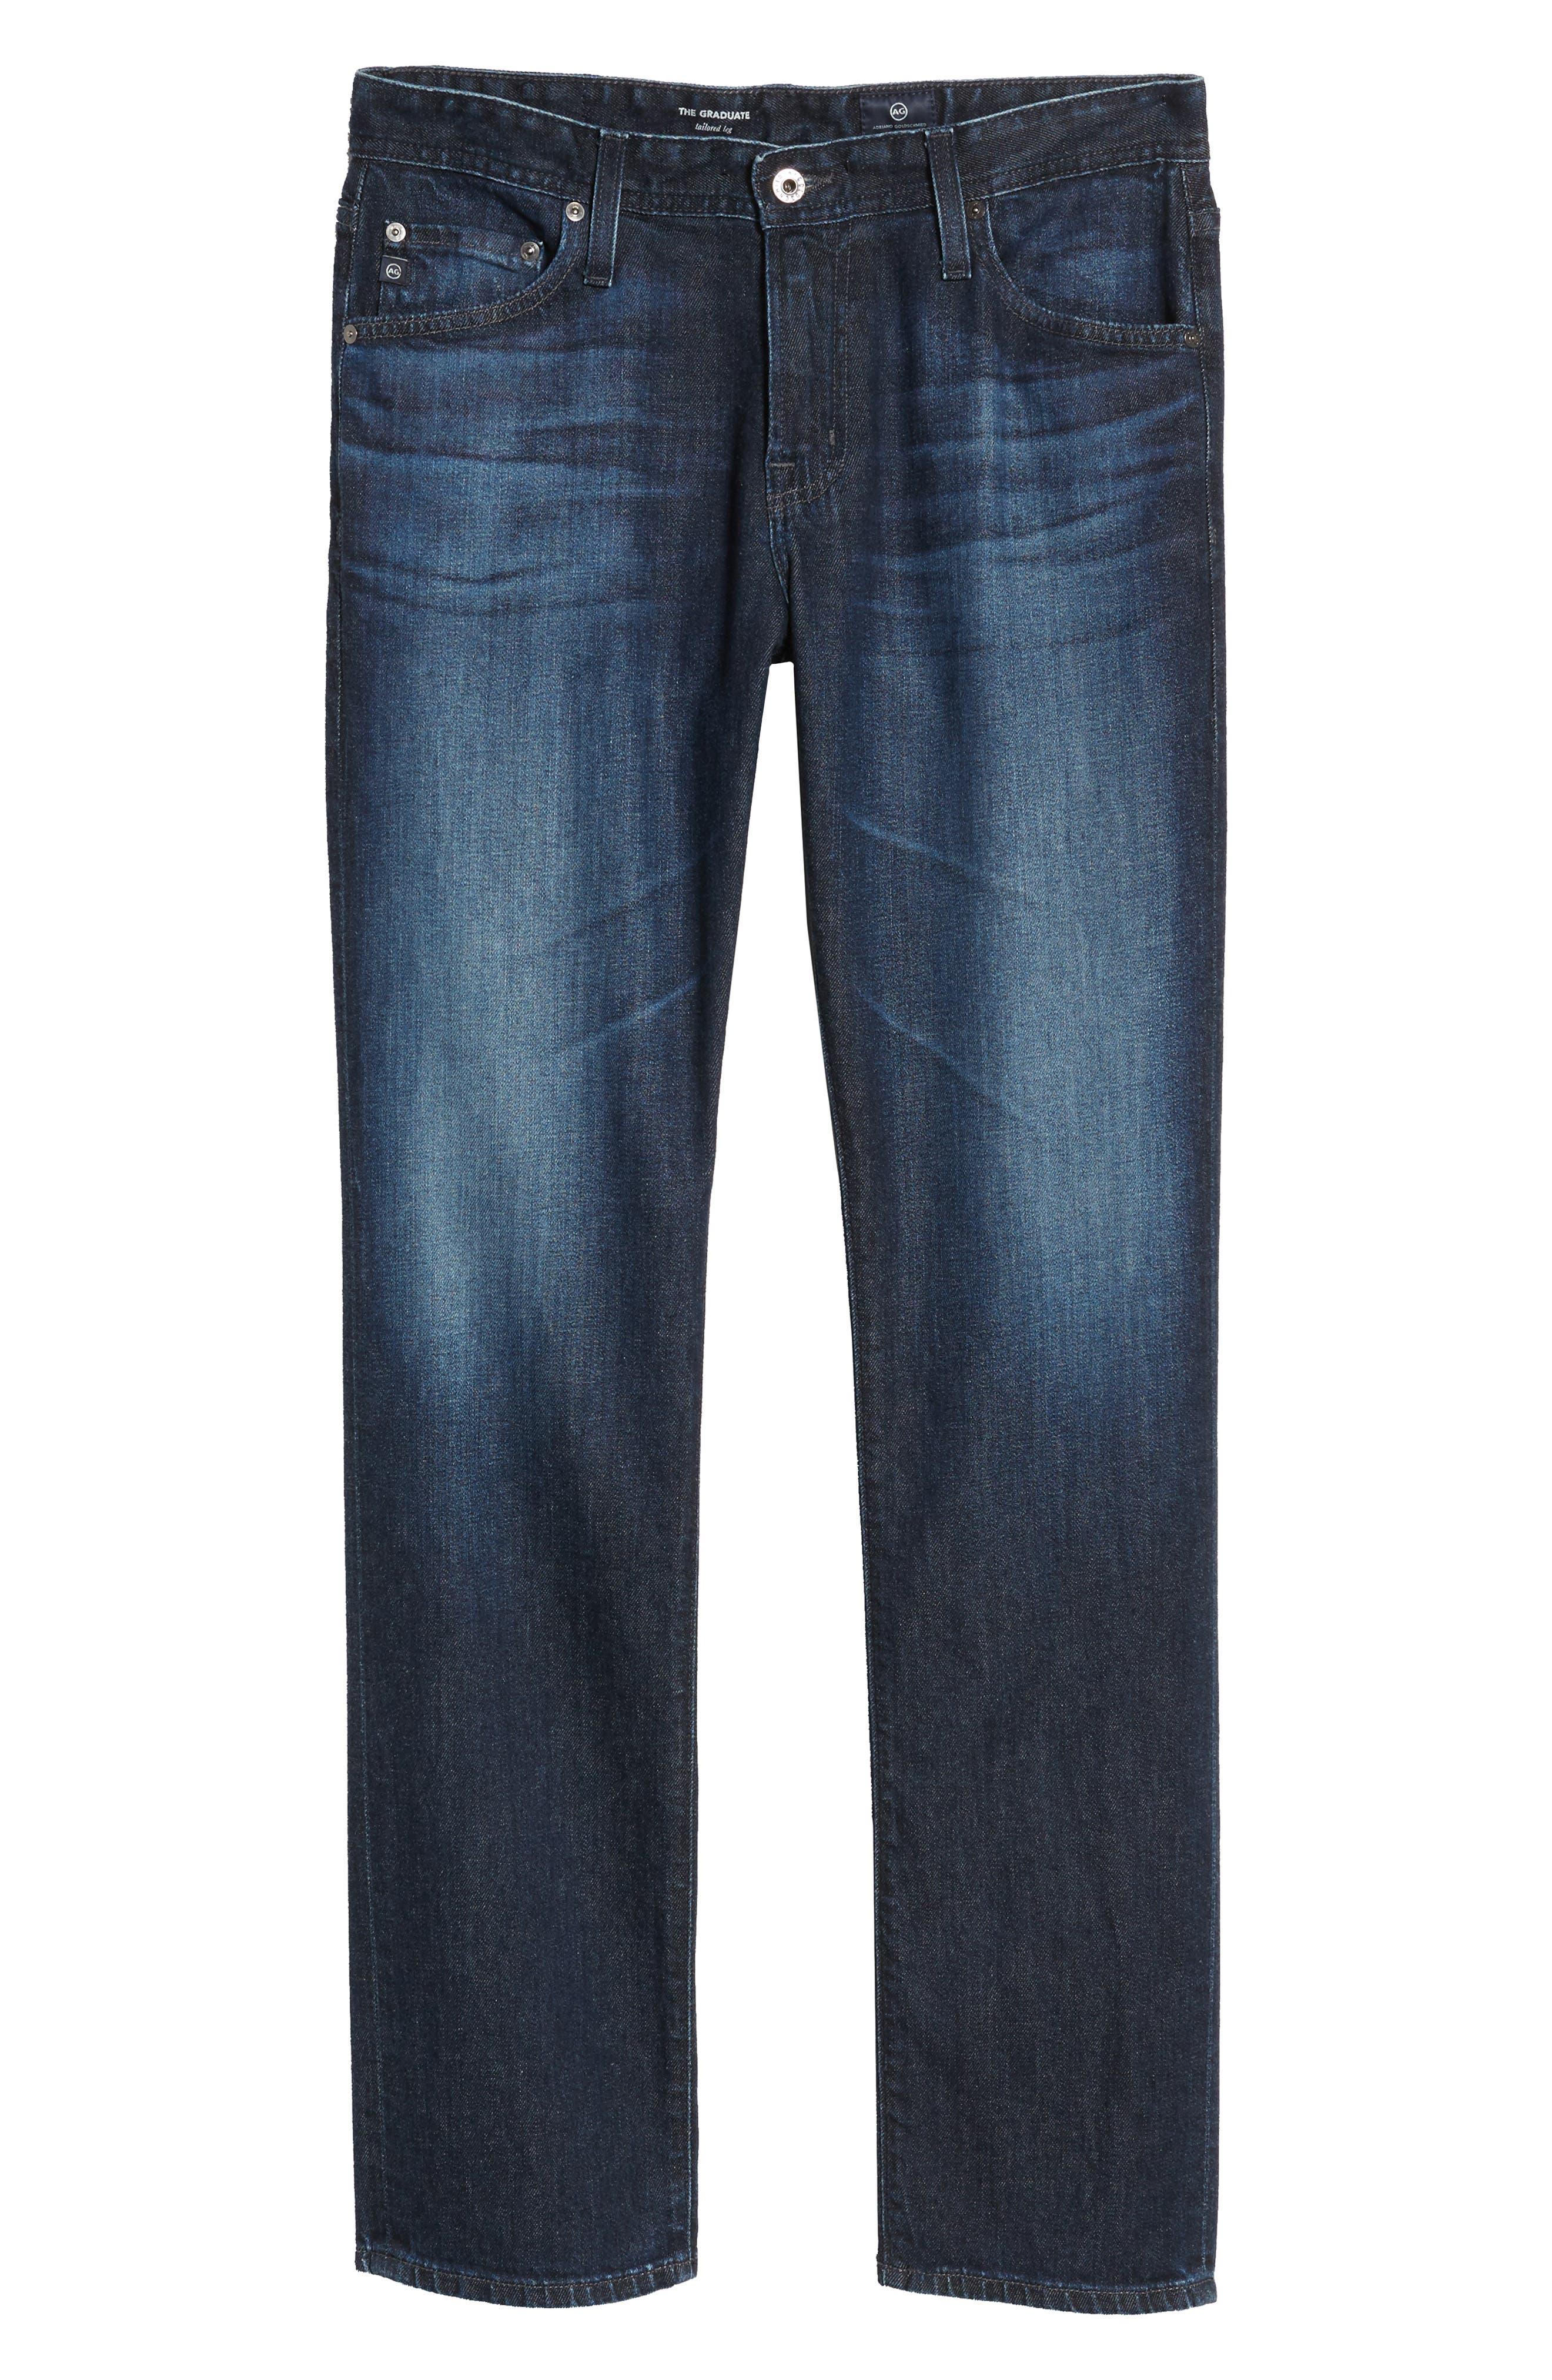 Graduate Slim Straight Leg Jeans,                             Alternate thumbnail 6, color,                             409